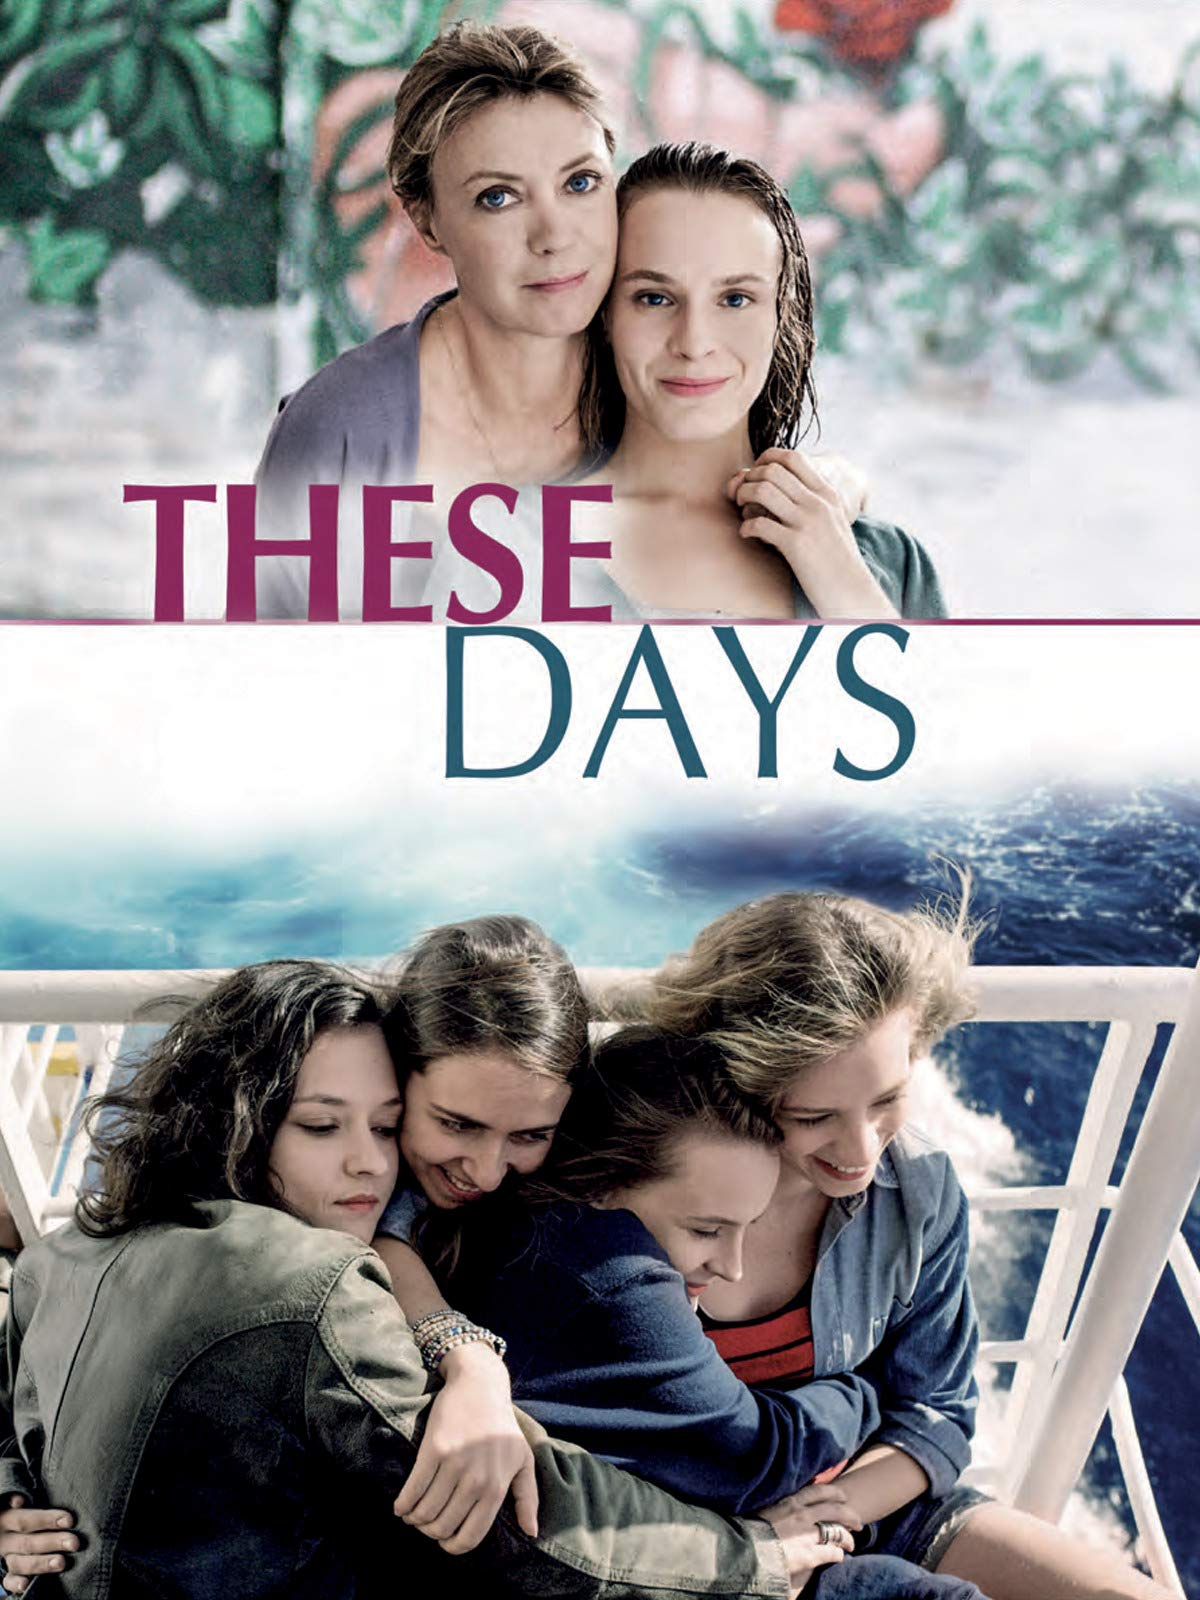 These Days - Questi giorni on Amazon Prime Video UK